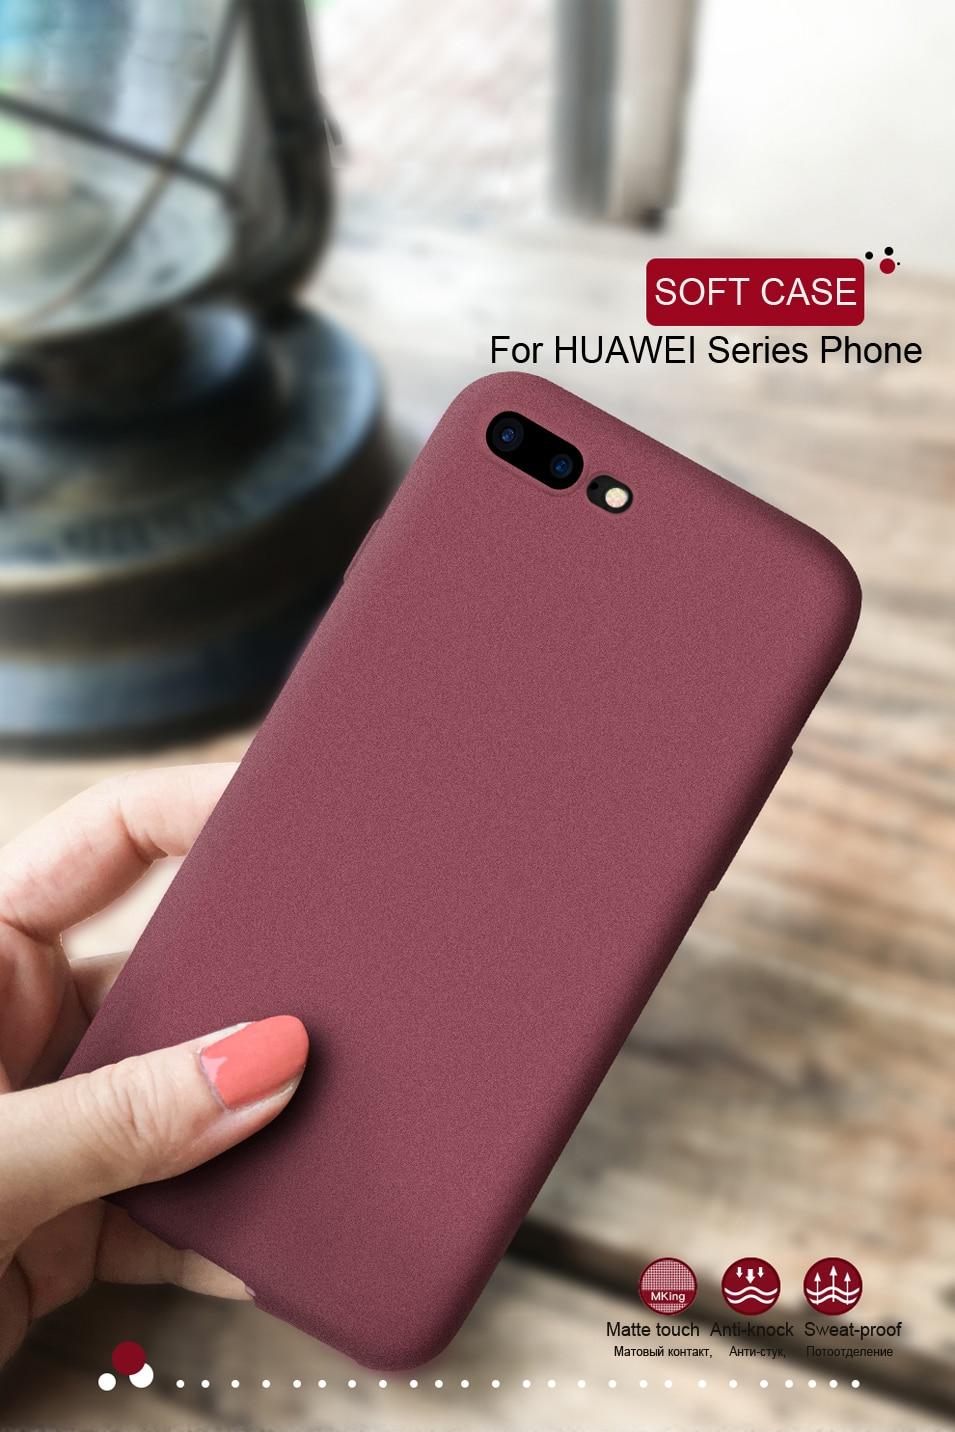 S10 Soft Silicone Matte Plain Protective Cover Neat Phone Case For Samsung Galaxy A50 A10 A30 A40 A60 A70 A80 A90 Bumper (12)